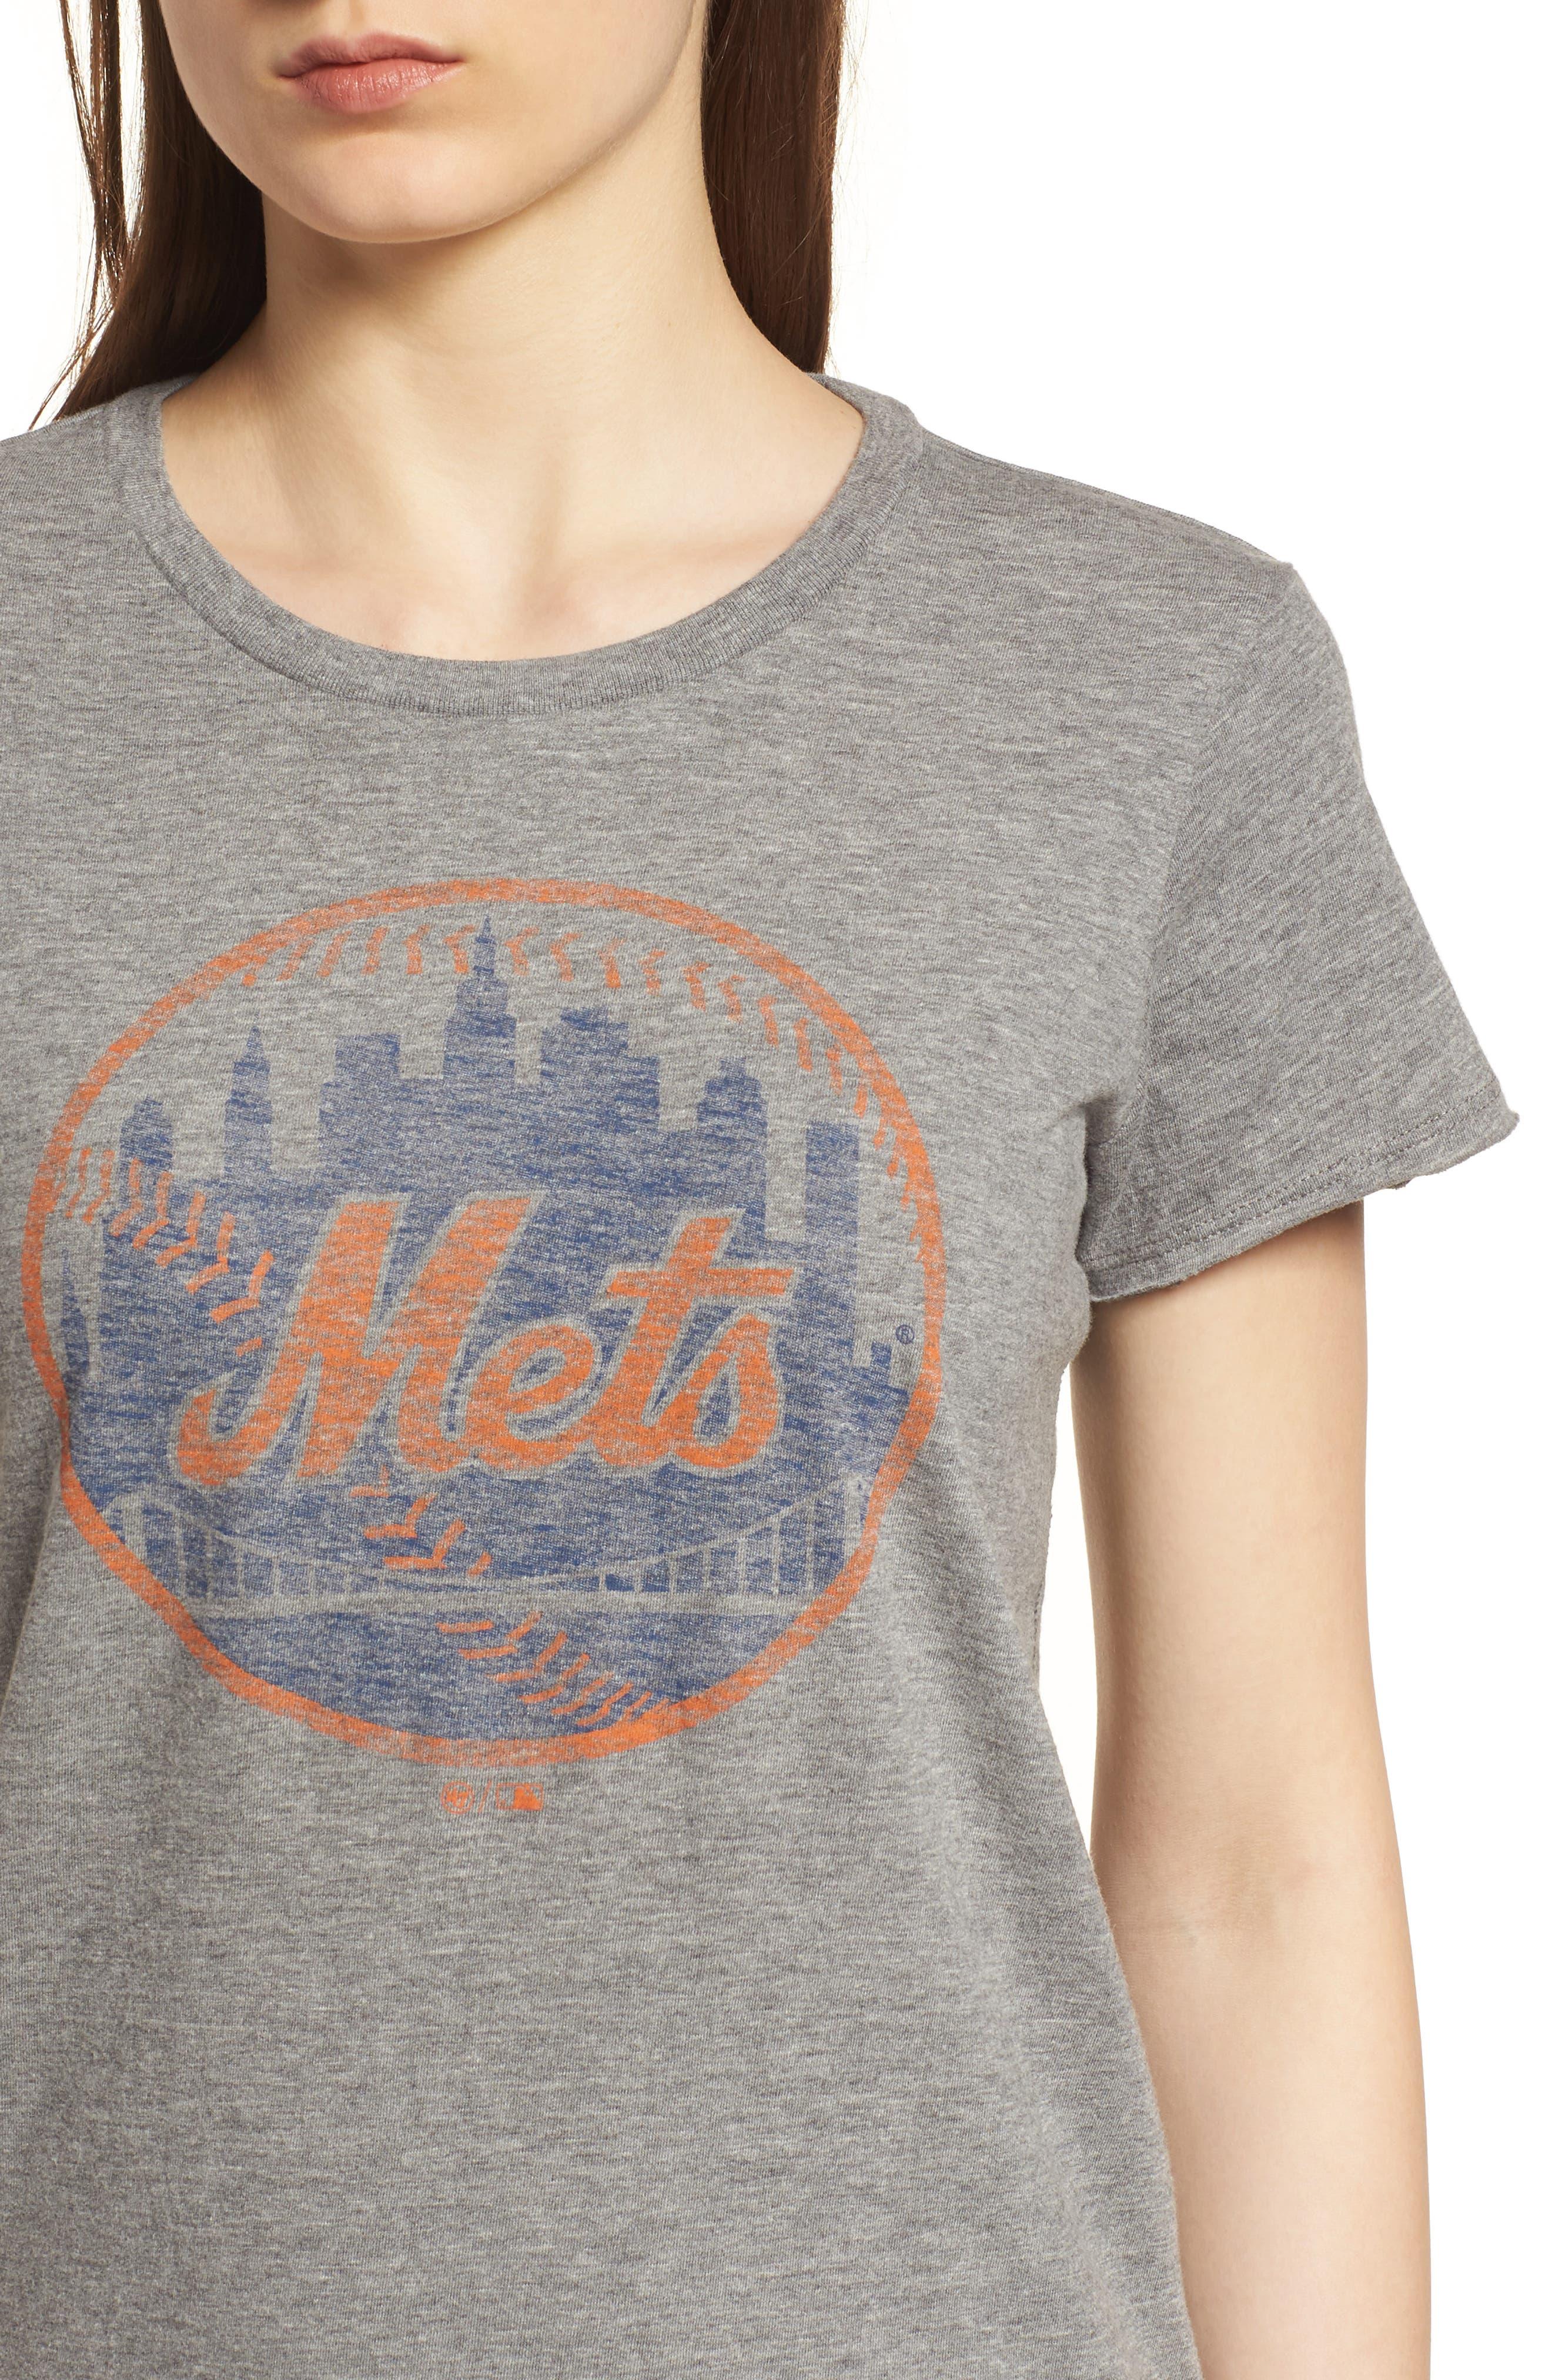 New York Mets Fader Letter Tee,                             Alternate thumbnail 4, color,                             Slate Grey